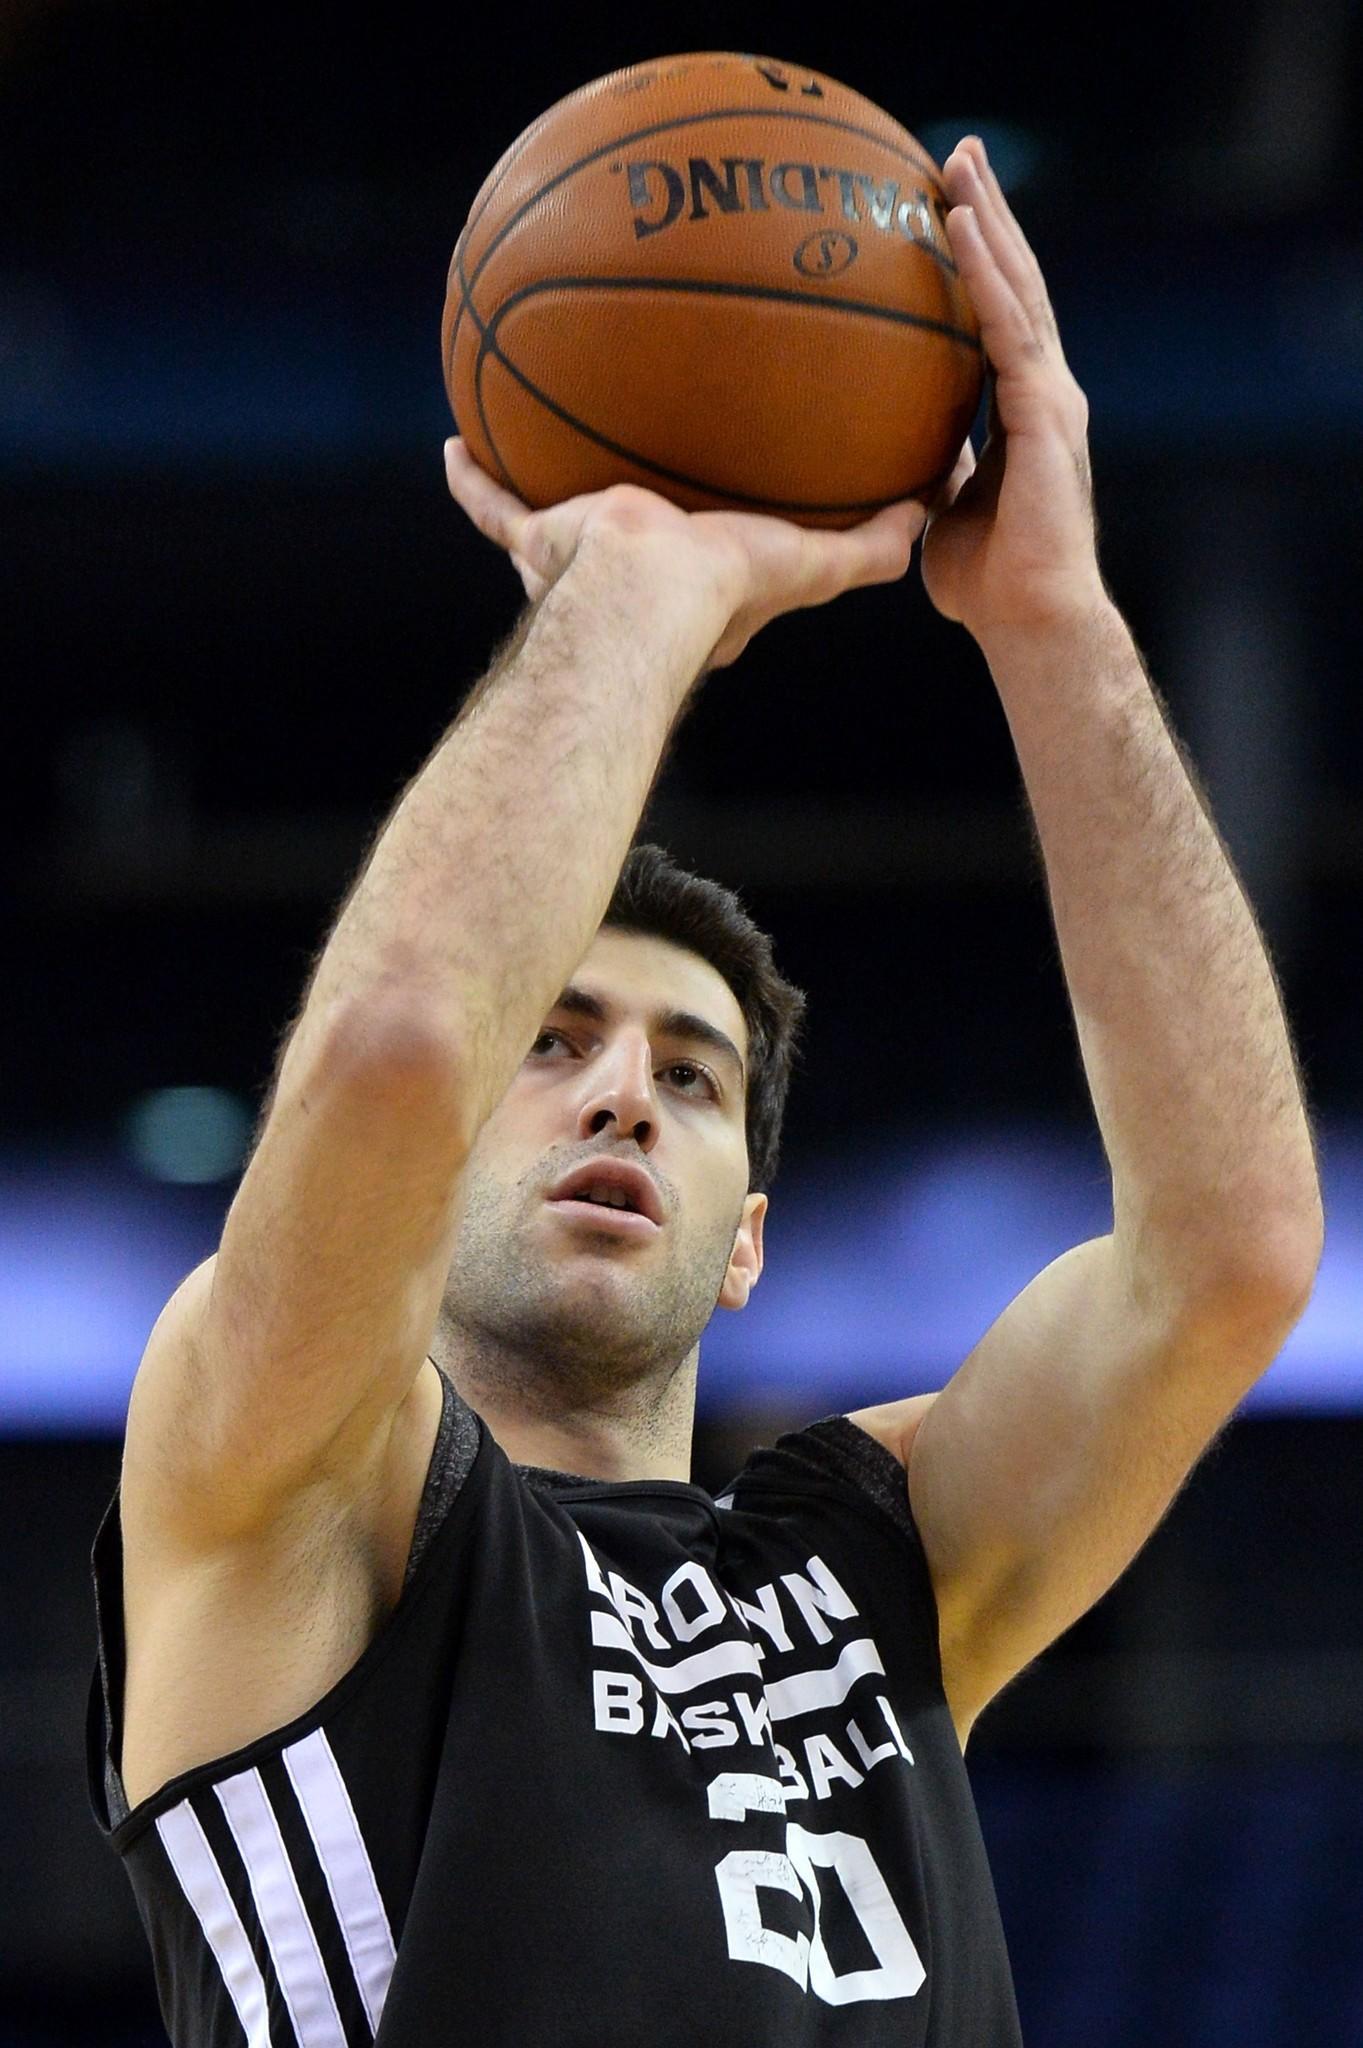 Brooklyn Nets' Georgian player Tornike Shengelia.